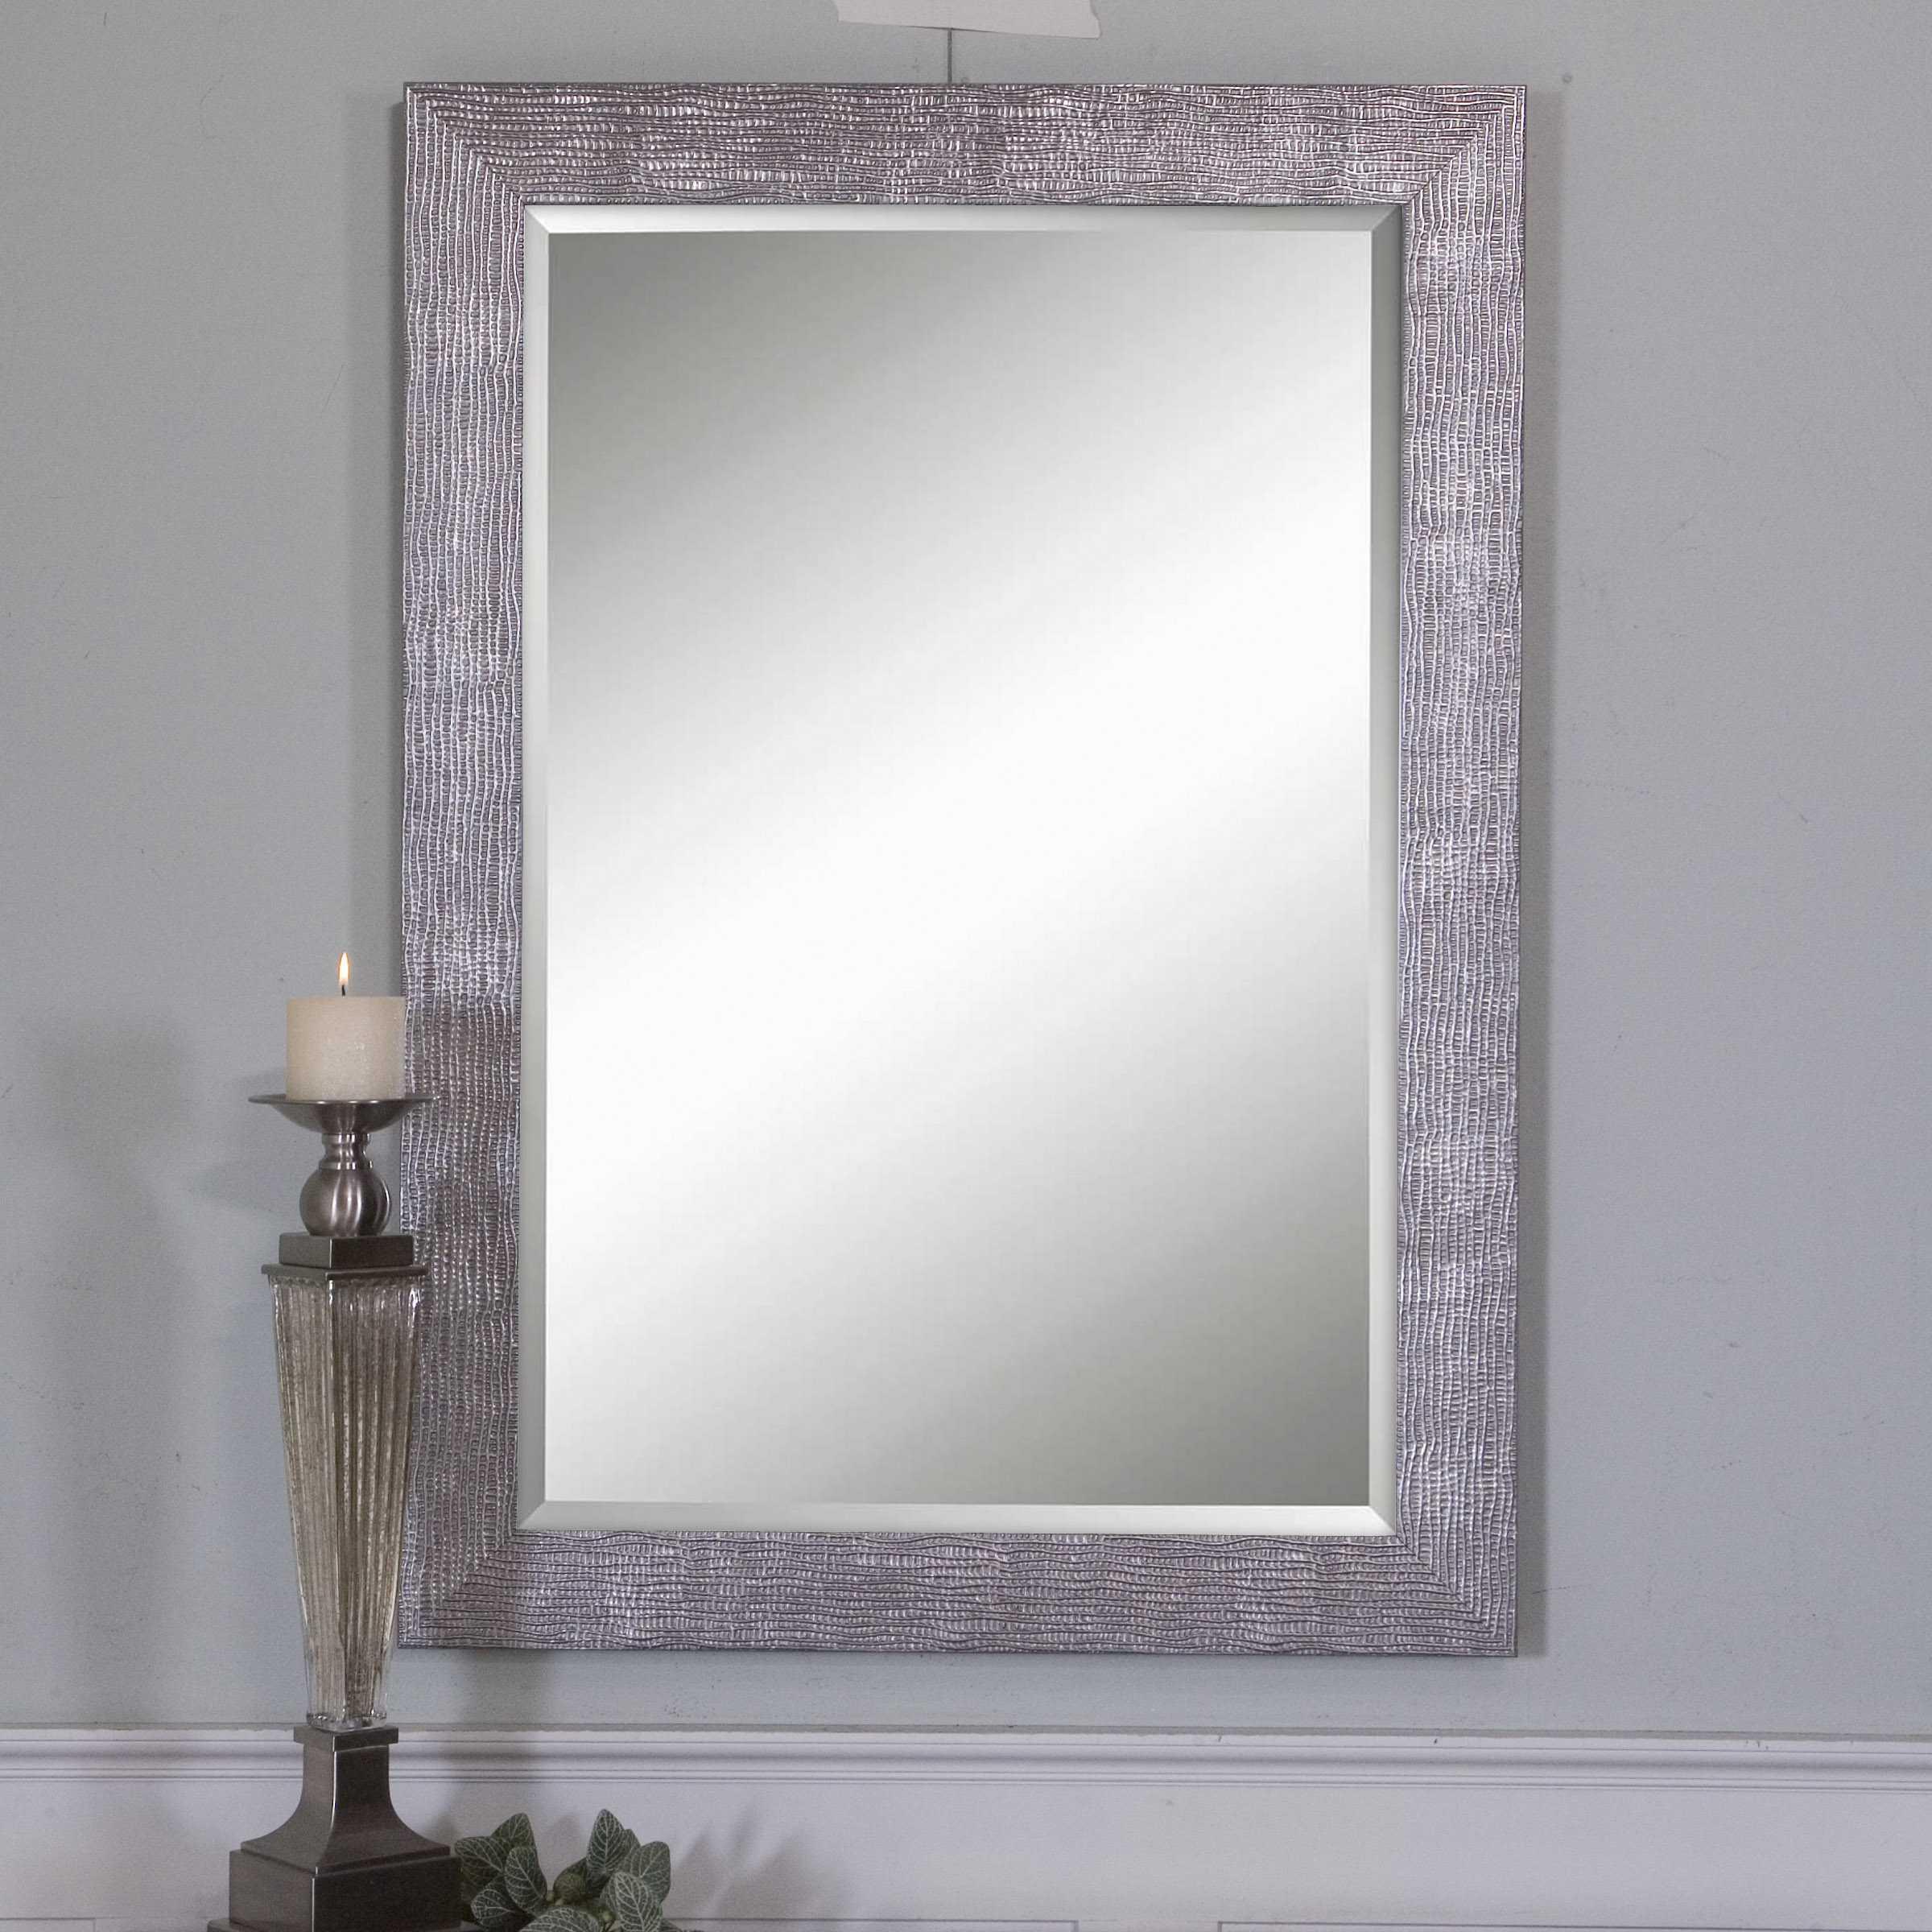 uttermost tarek 30 x 42 wall mirror ut14604. Black Bedroom Furniture Sets. Home Design Ideas